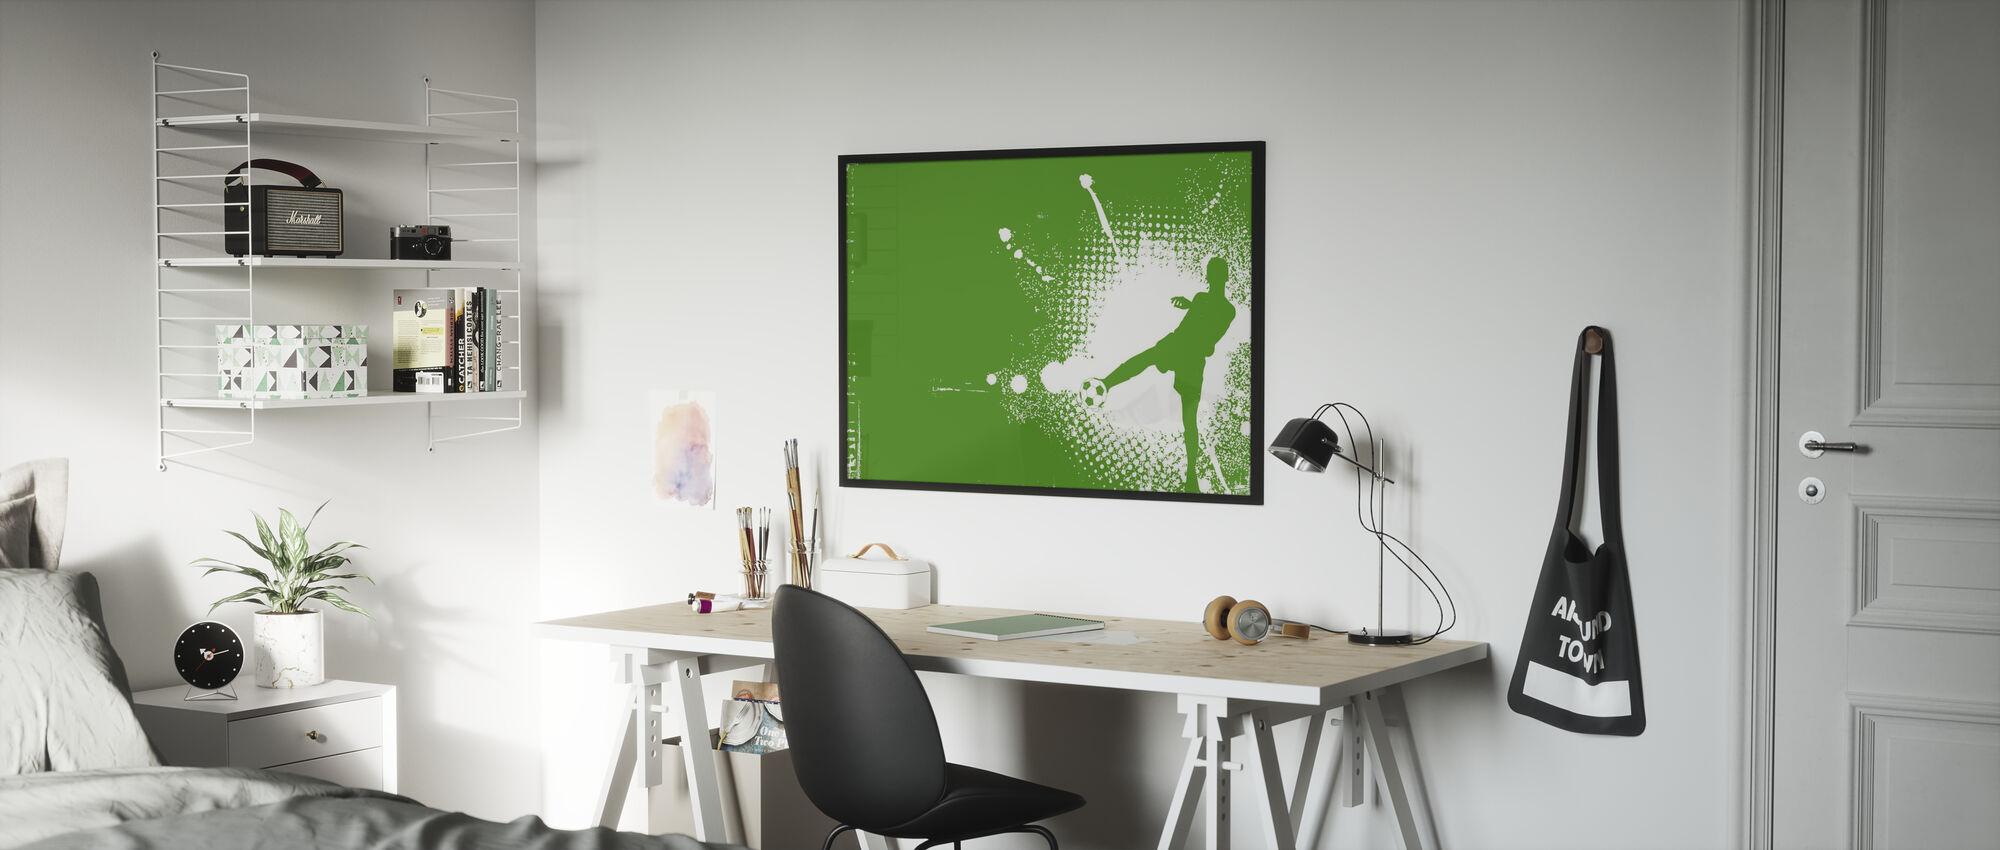 Voetbalspeler Groen - Ingelijste print - Kinderkamer